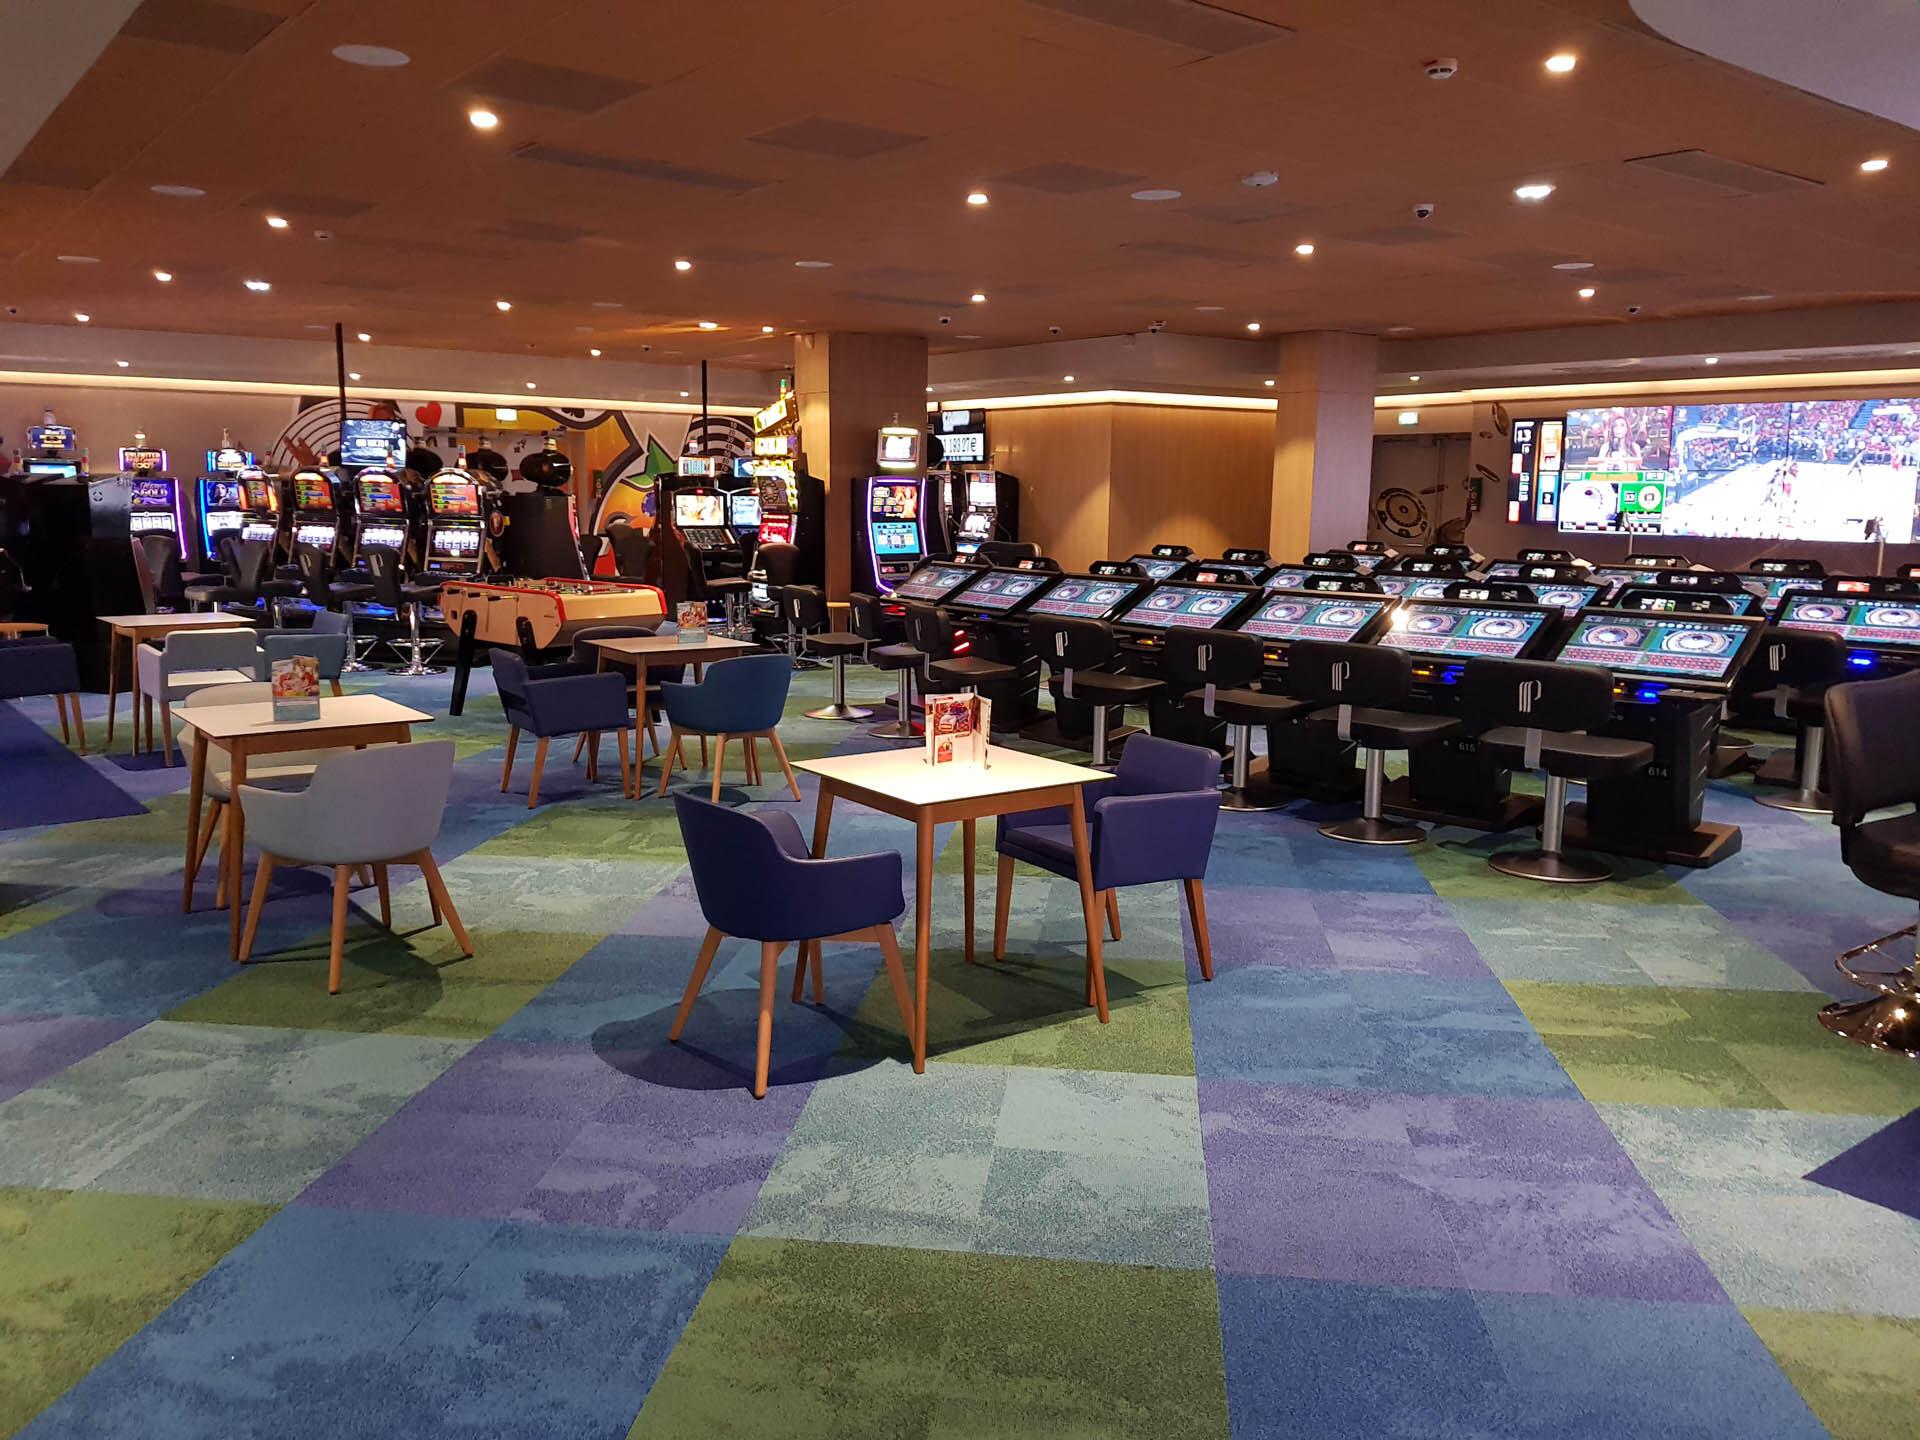 Restaurant at Grand Hotel du Casino in Dieppe, France